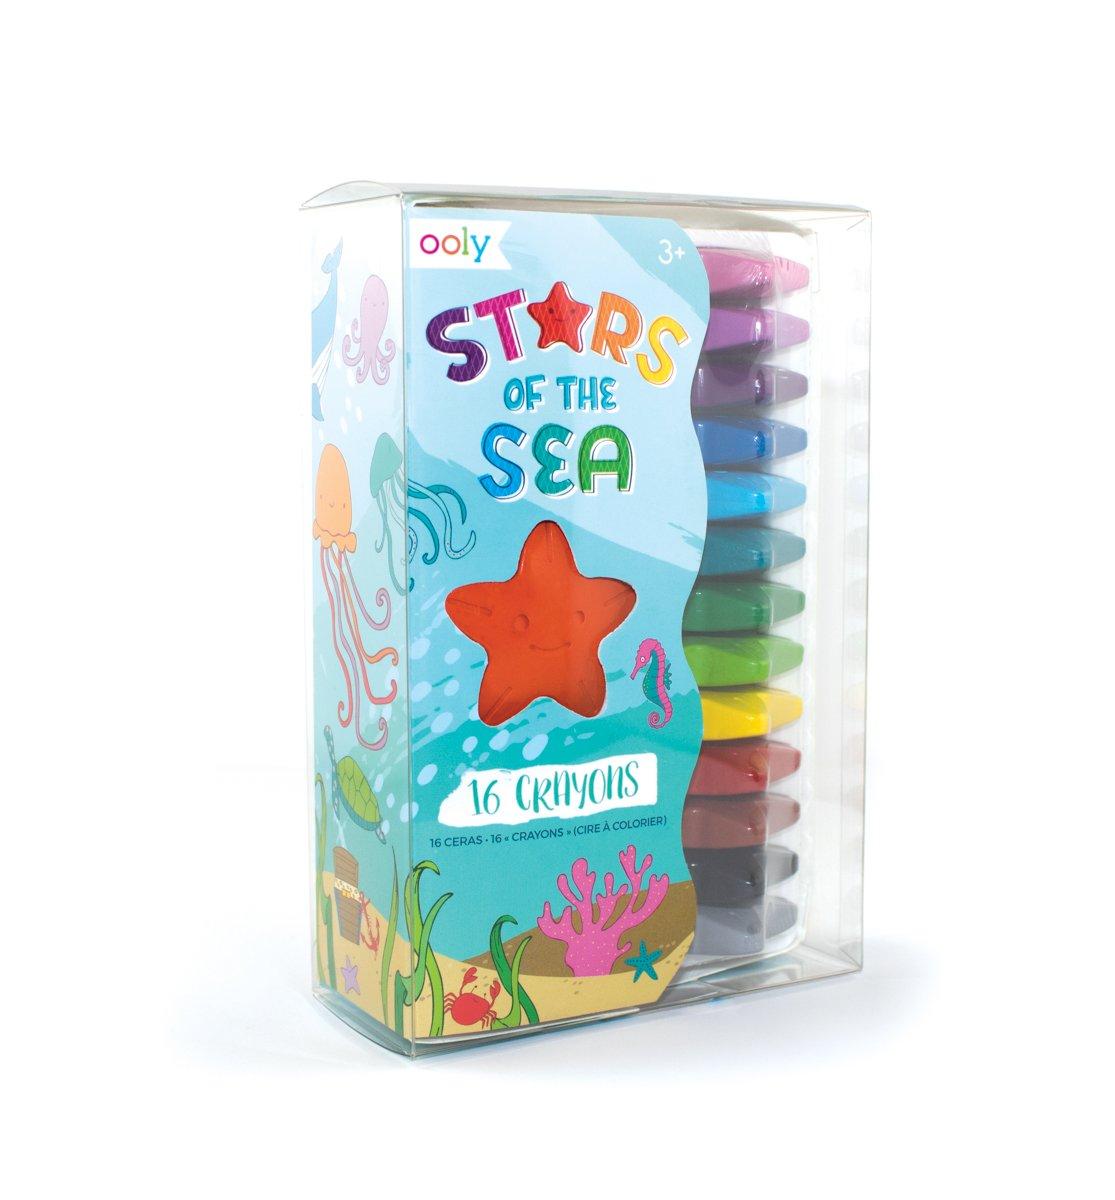 Ooly - Krijtjes 'Stars Of The Sea'